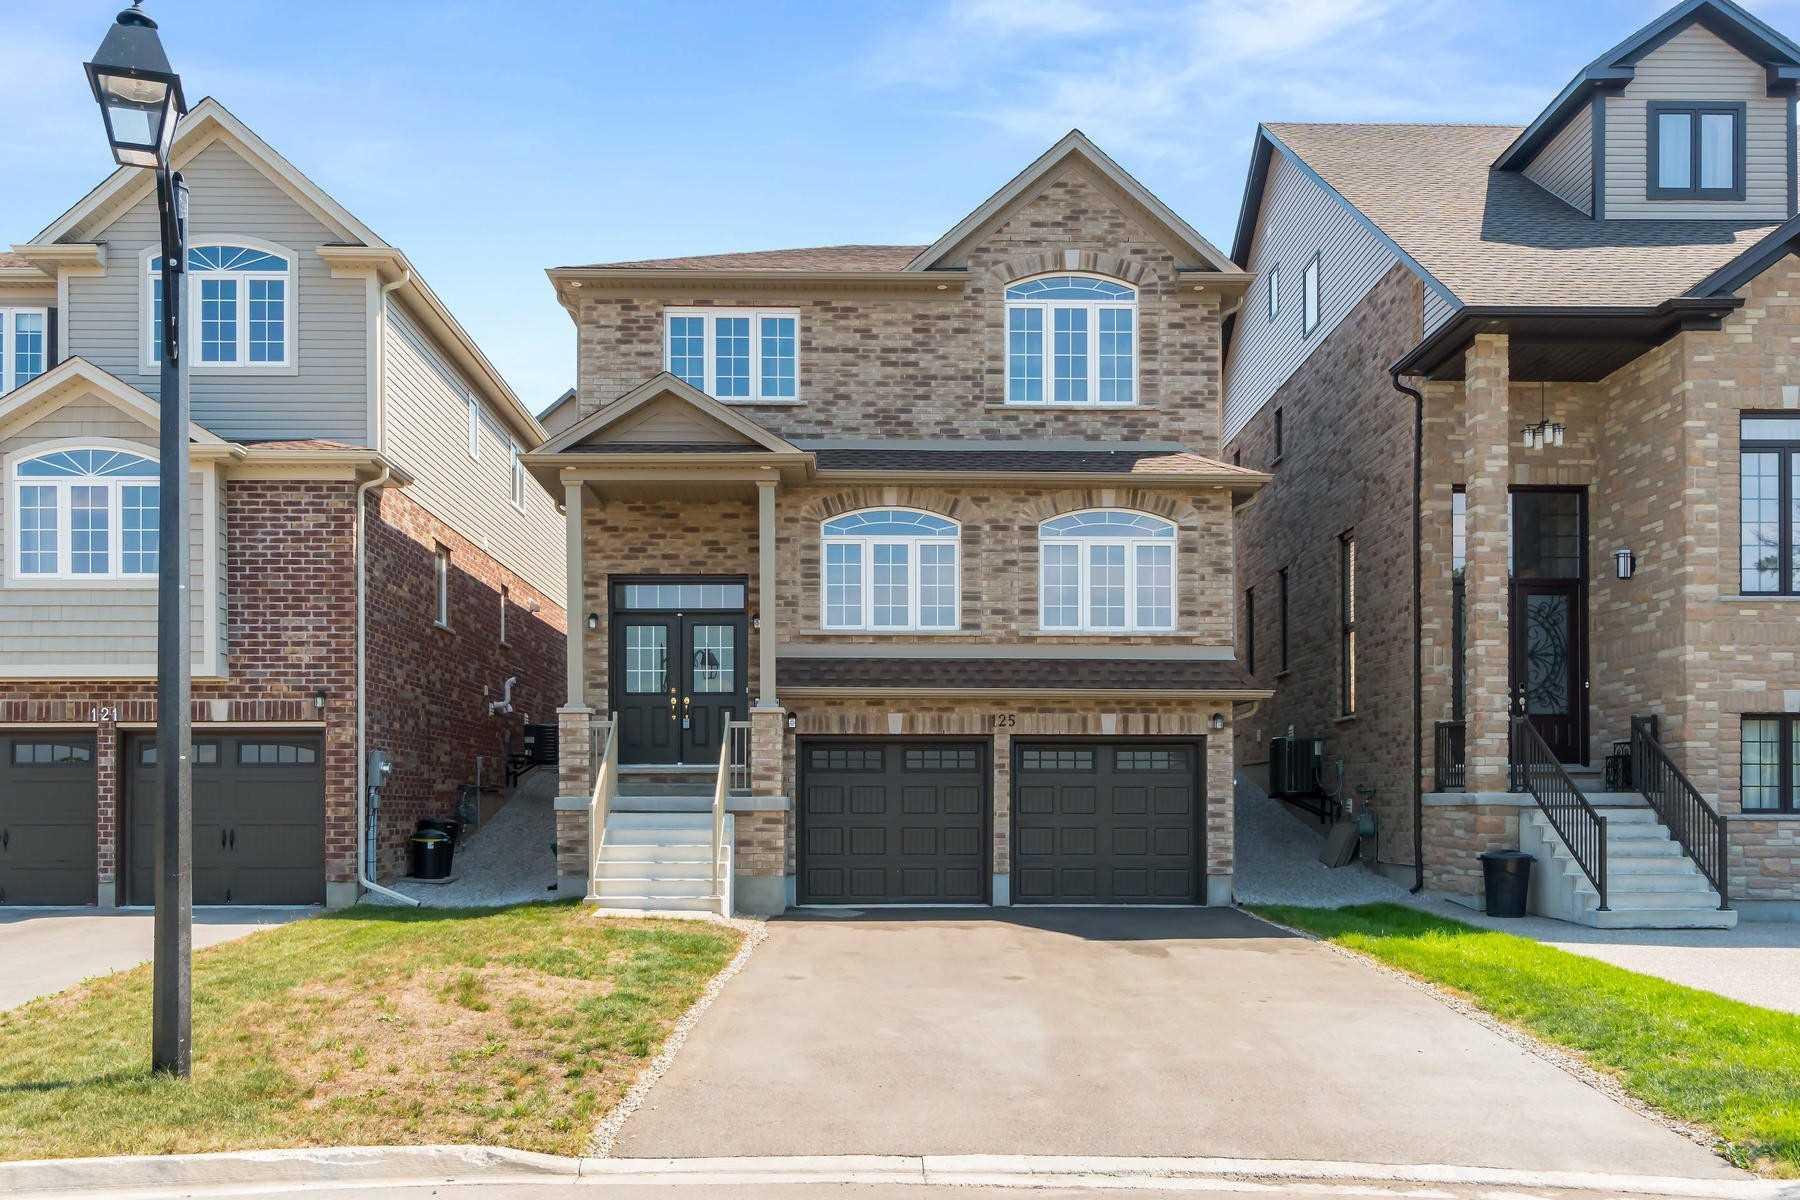 125 Gagnon Pl, Guelph/Eramosa, Ontario N0B 2K0, 4 Bedrooms Bedrooms, 10 Rooms Rooms,3 BathroomsBathrooms,Detached,For Sale,Gagnon,X4926651